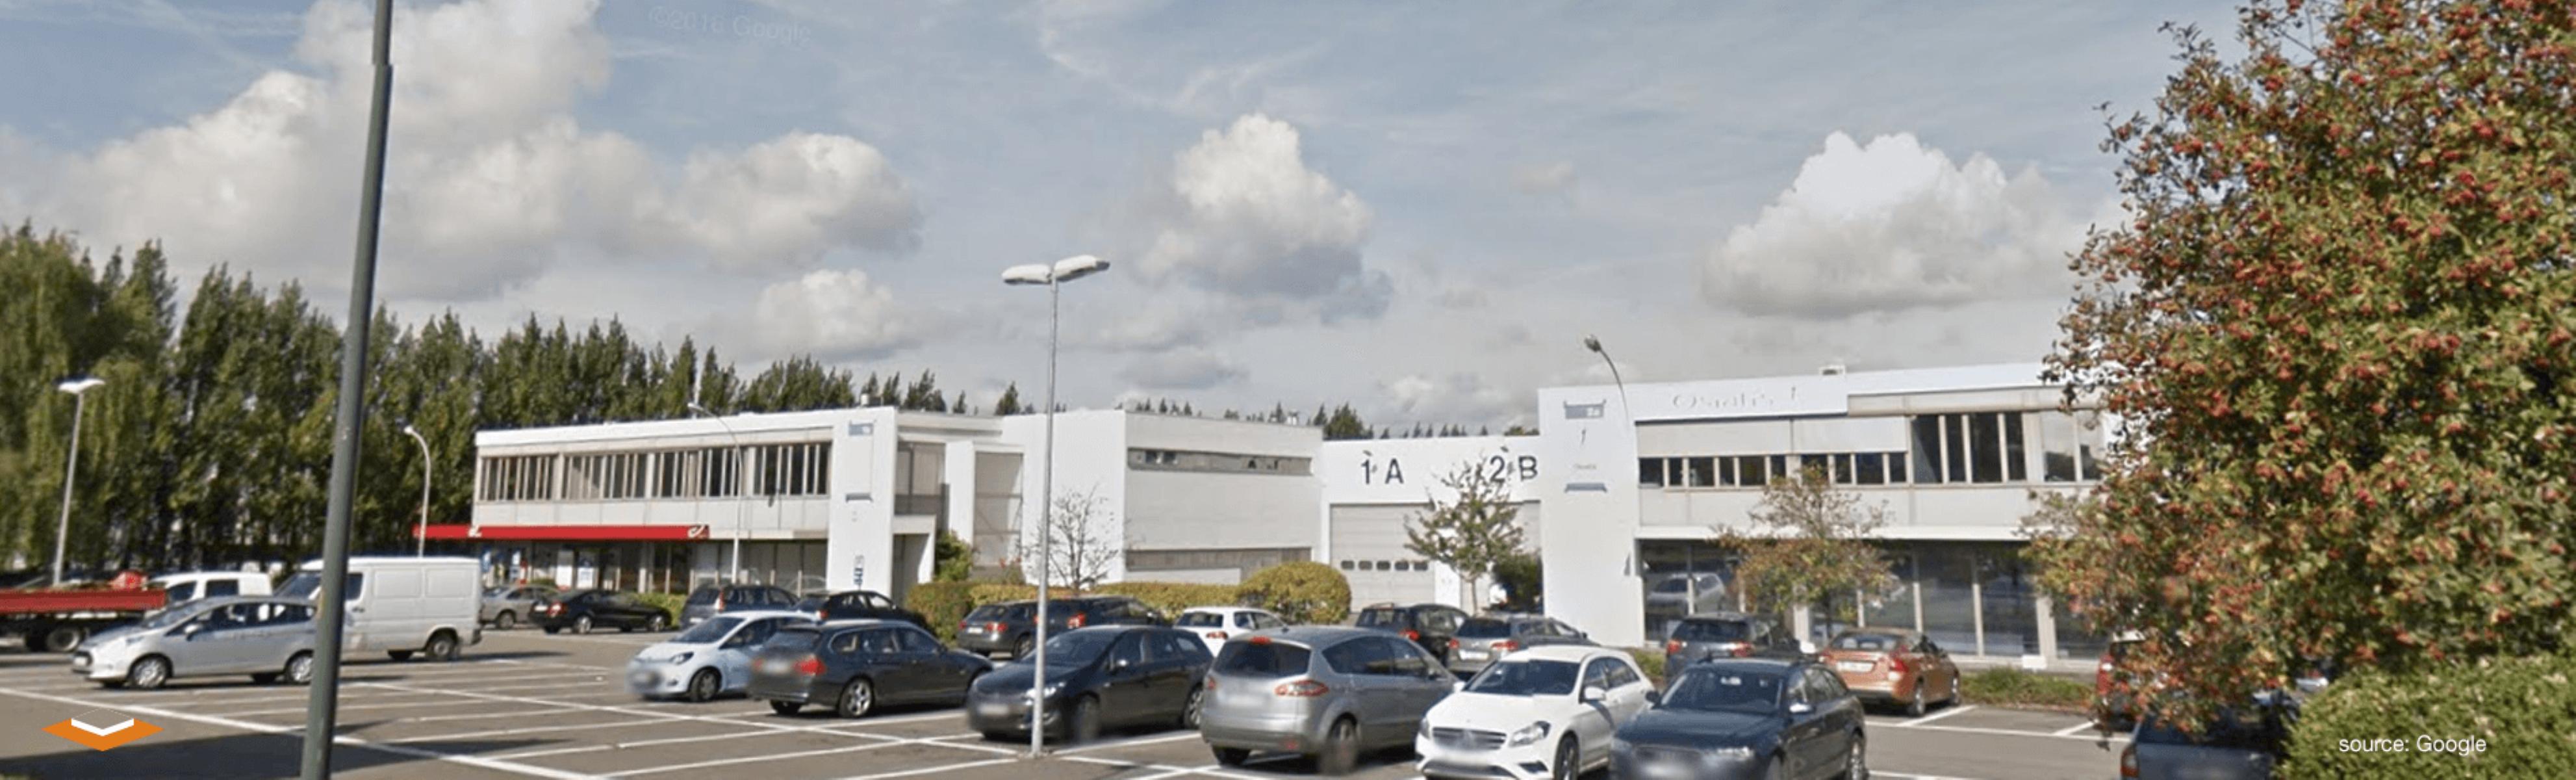 industrieel gebouw te huur I058 - Leuvensesteenweg 573, 1930 Zaventem, België 2